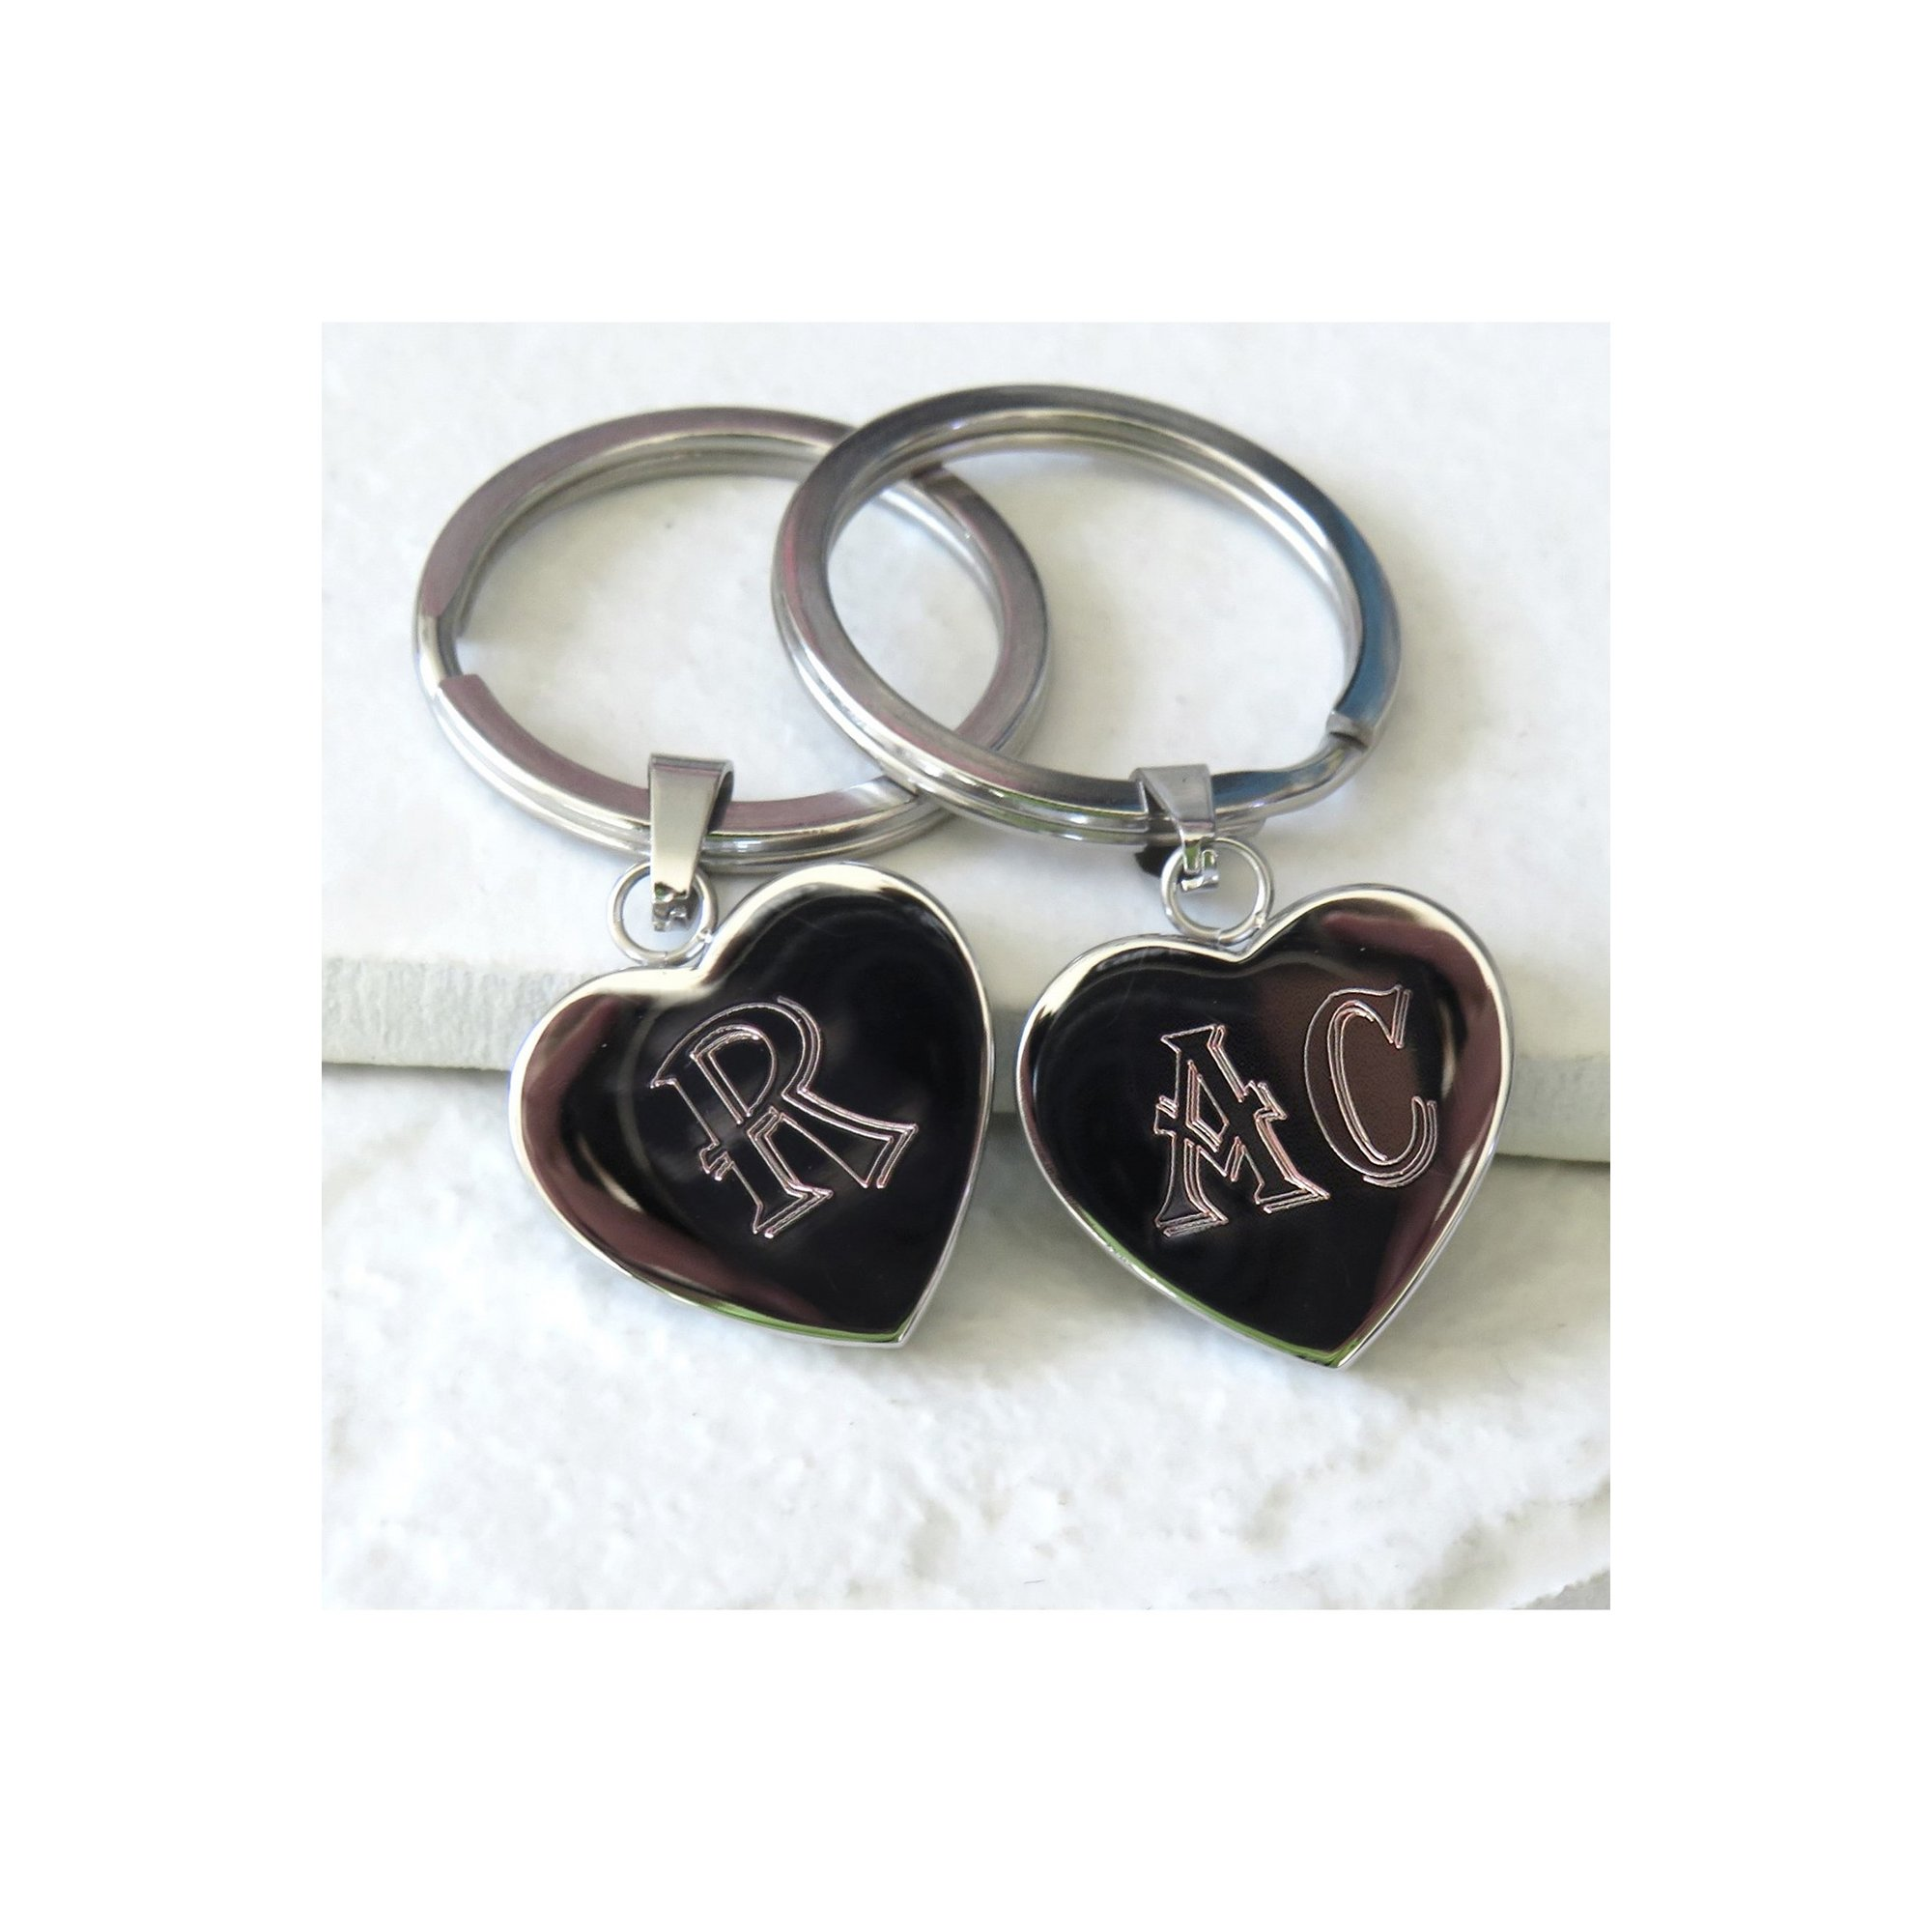 Image of Personalised Initials Heart Metal Keyring